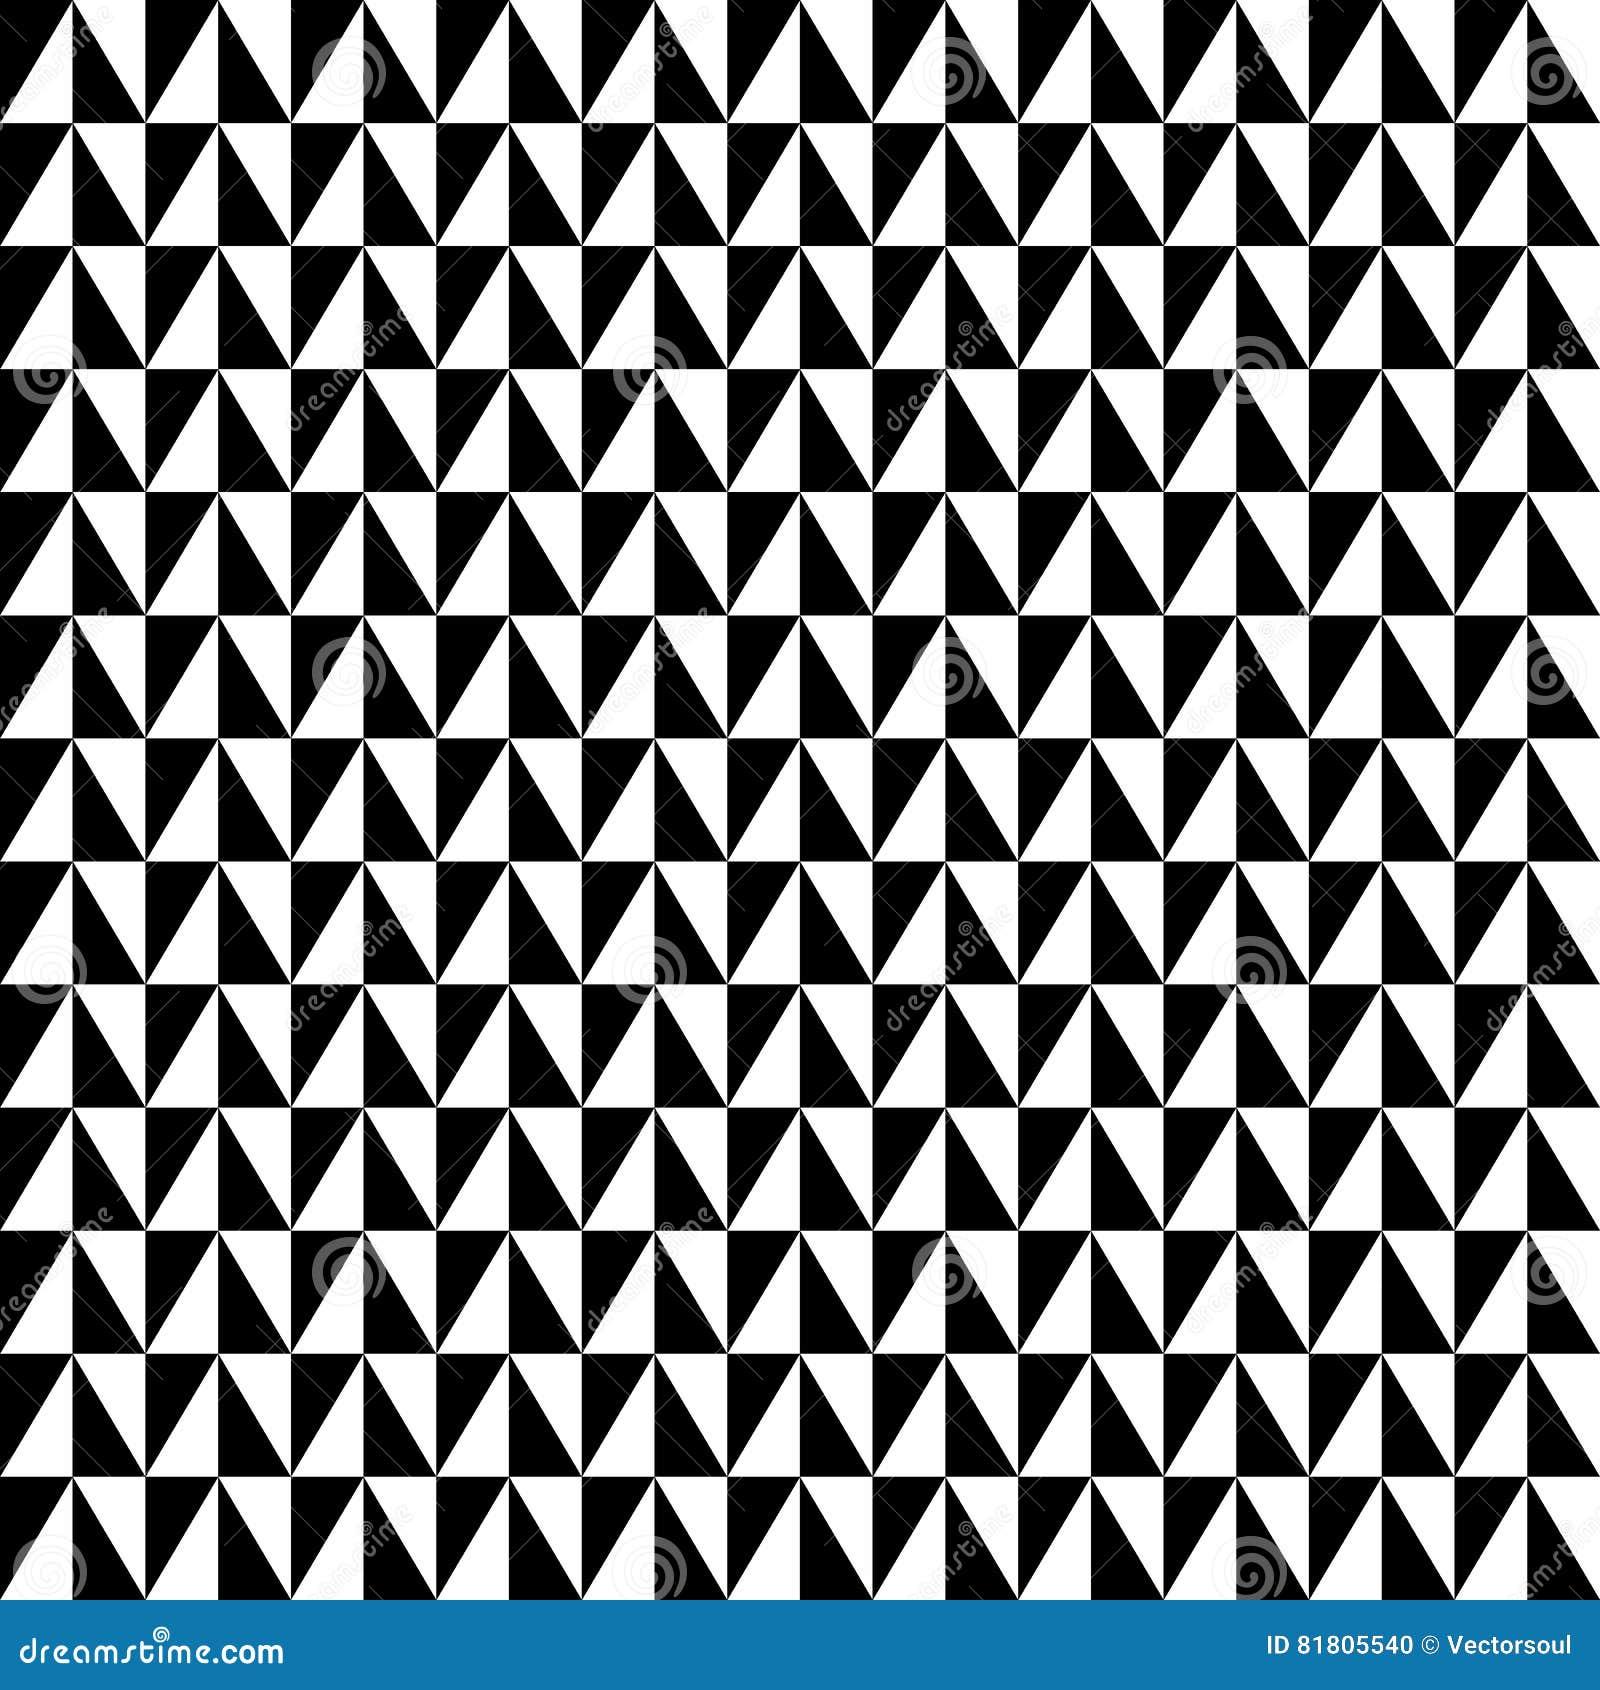 Repeatable contrasty геометрическая картина Мозаика треугольников с